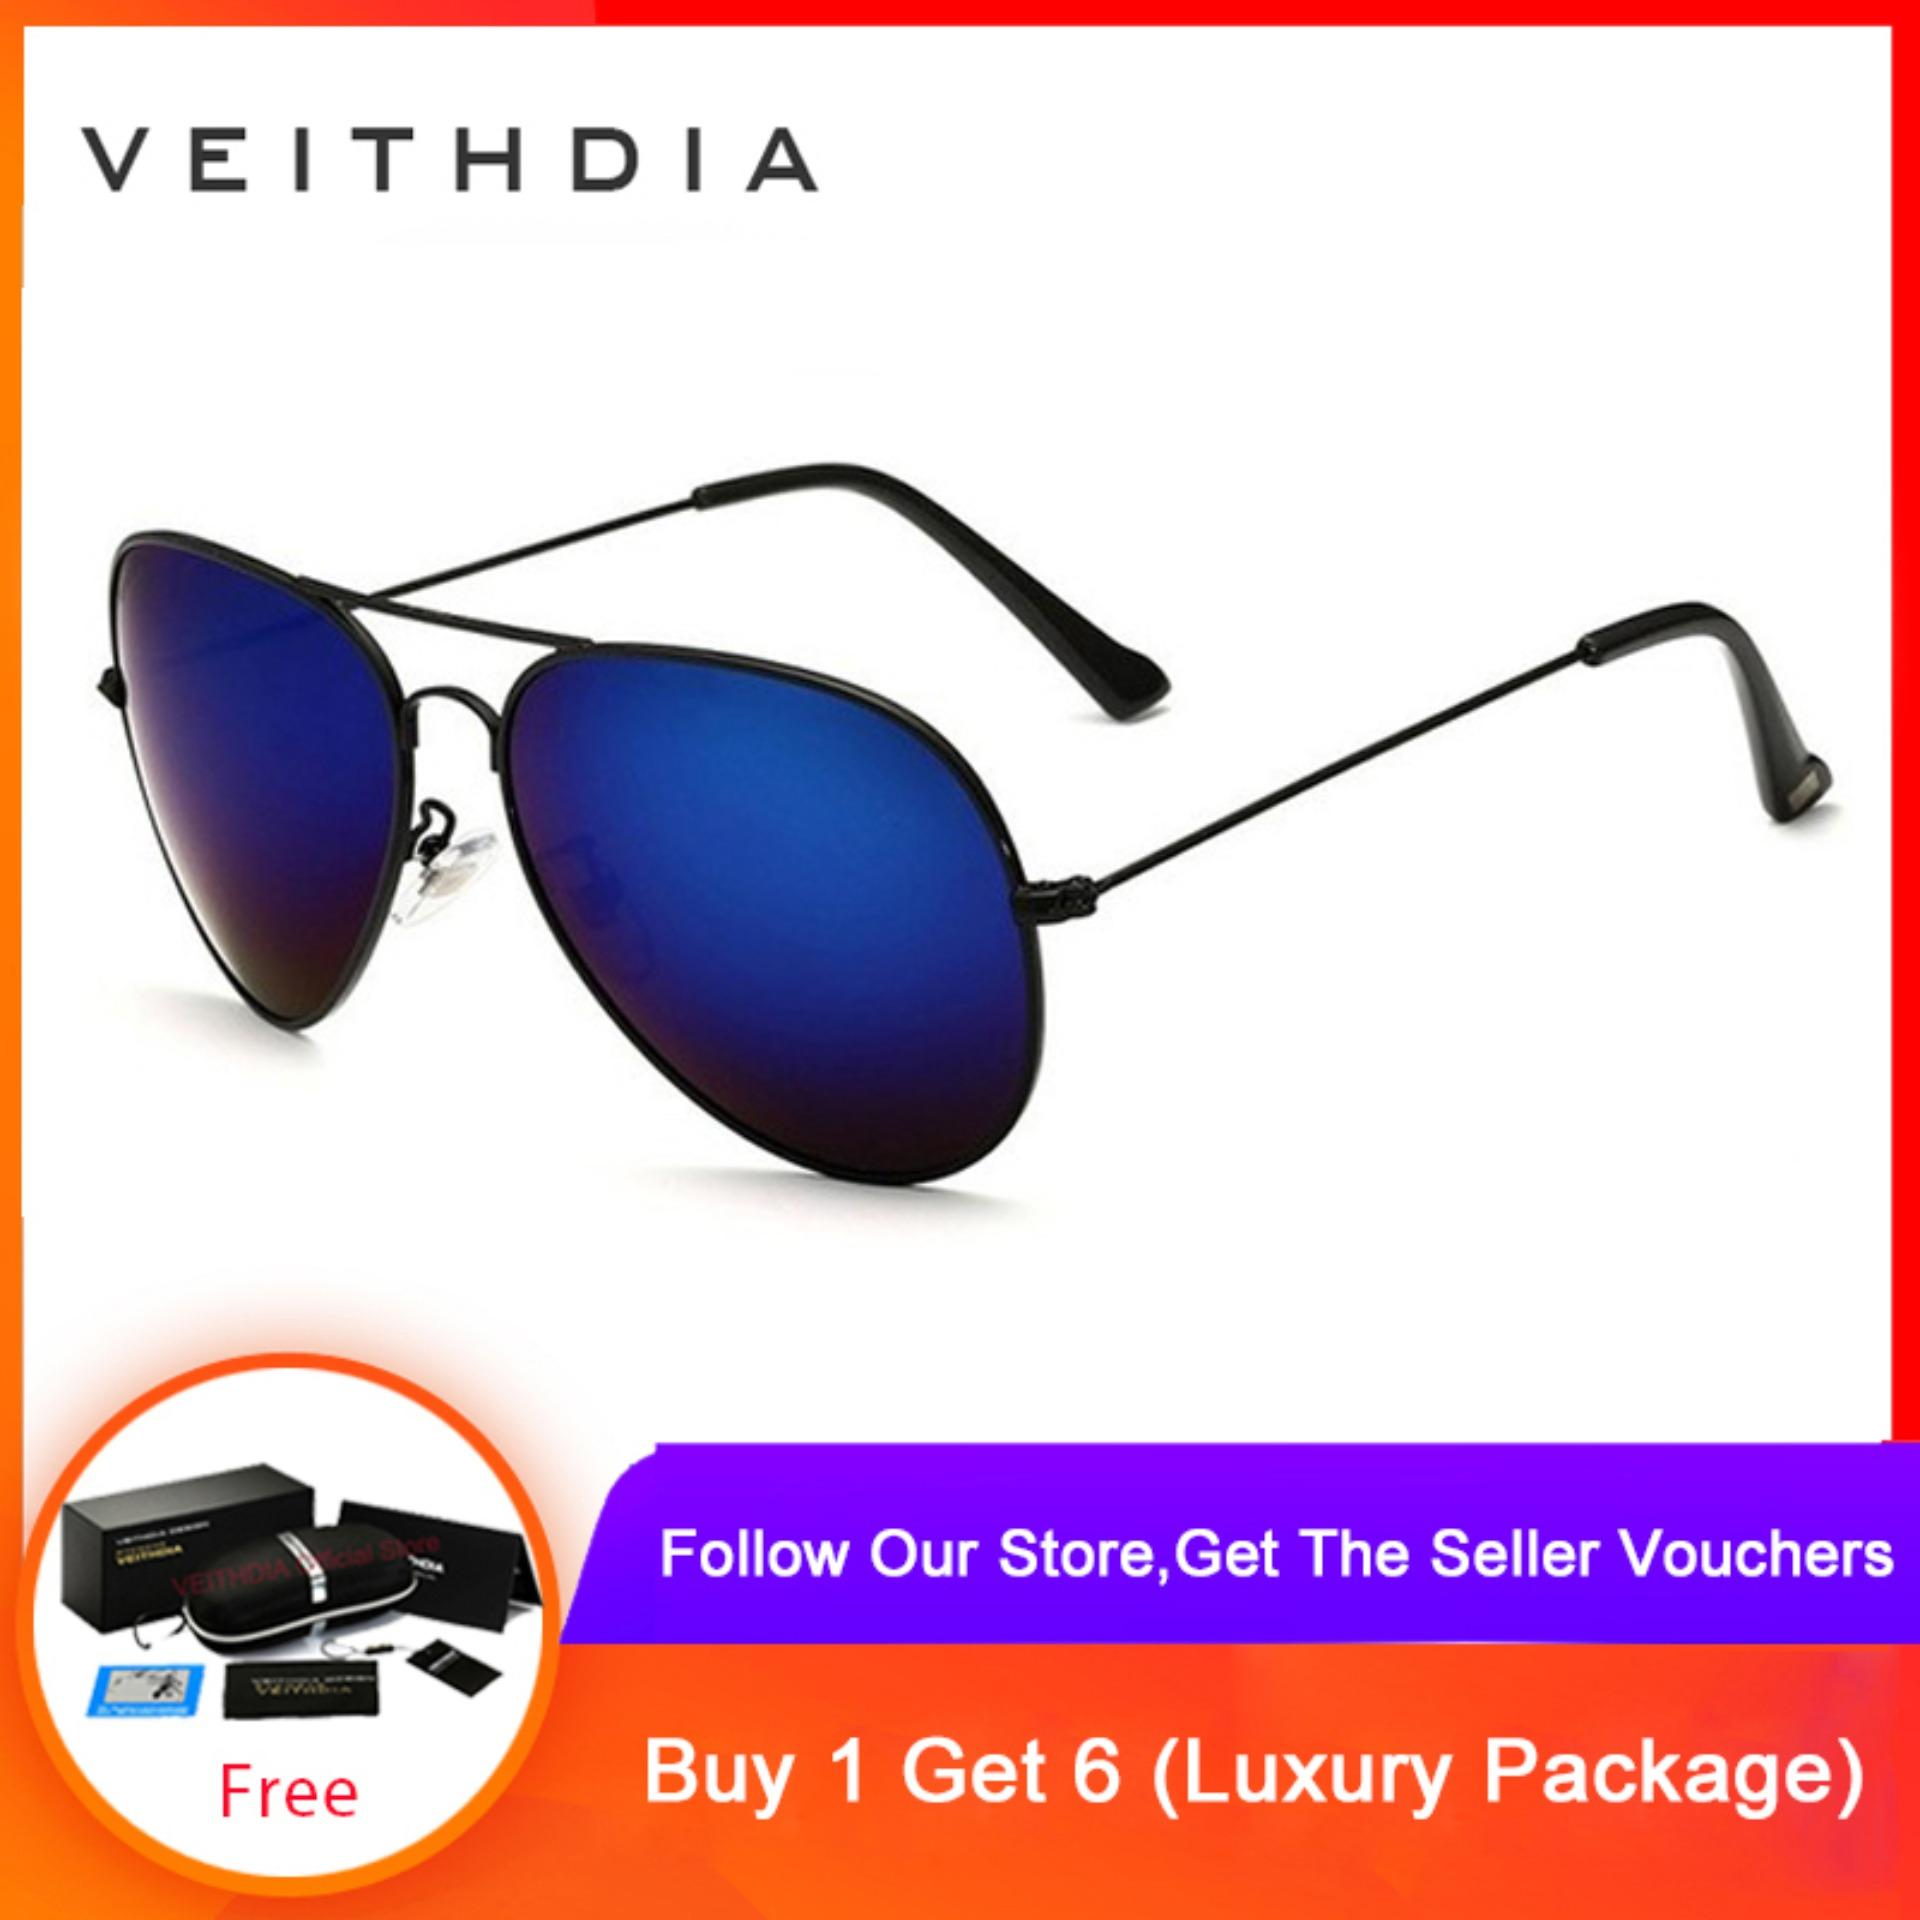 COD+Pengiriman Gratis VEITHDIA Merek Fashion Klasik Pria/wanita Terpolarisasi Kacamata Hitam Warna Lapisan